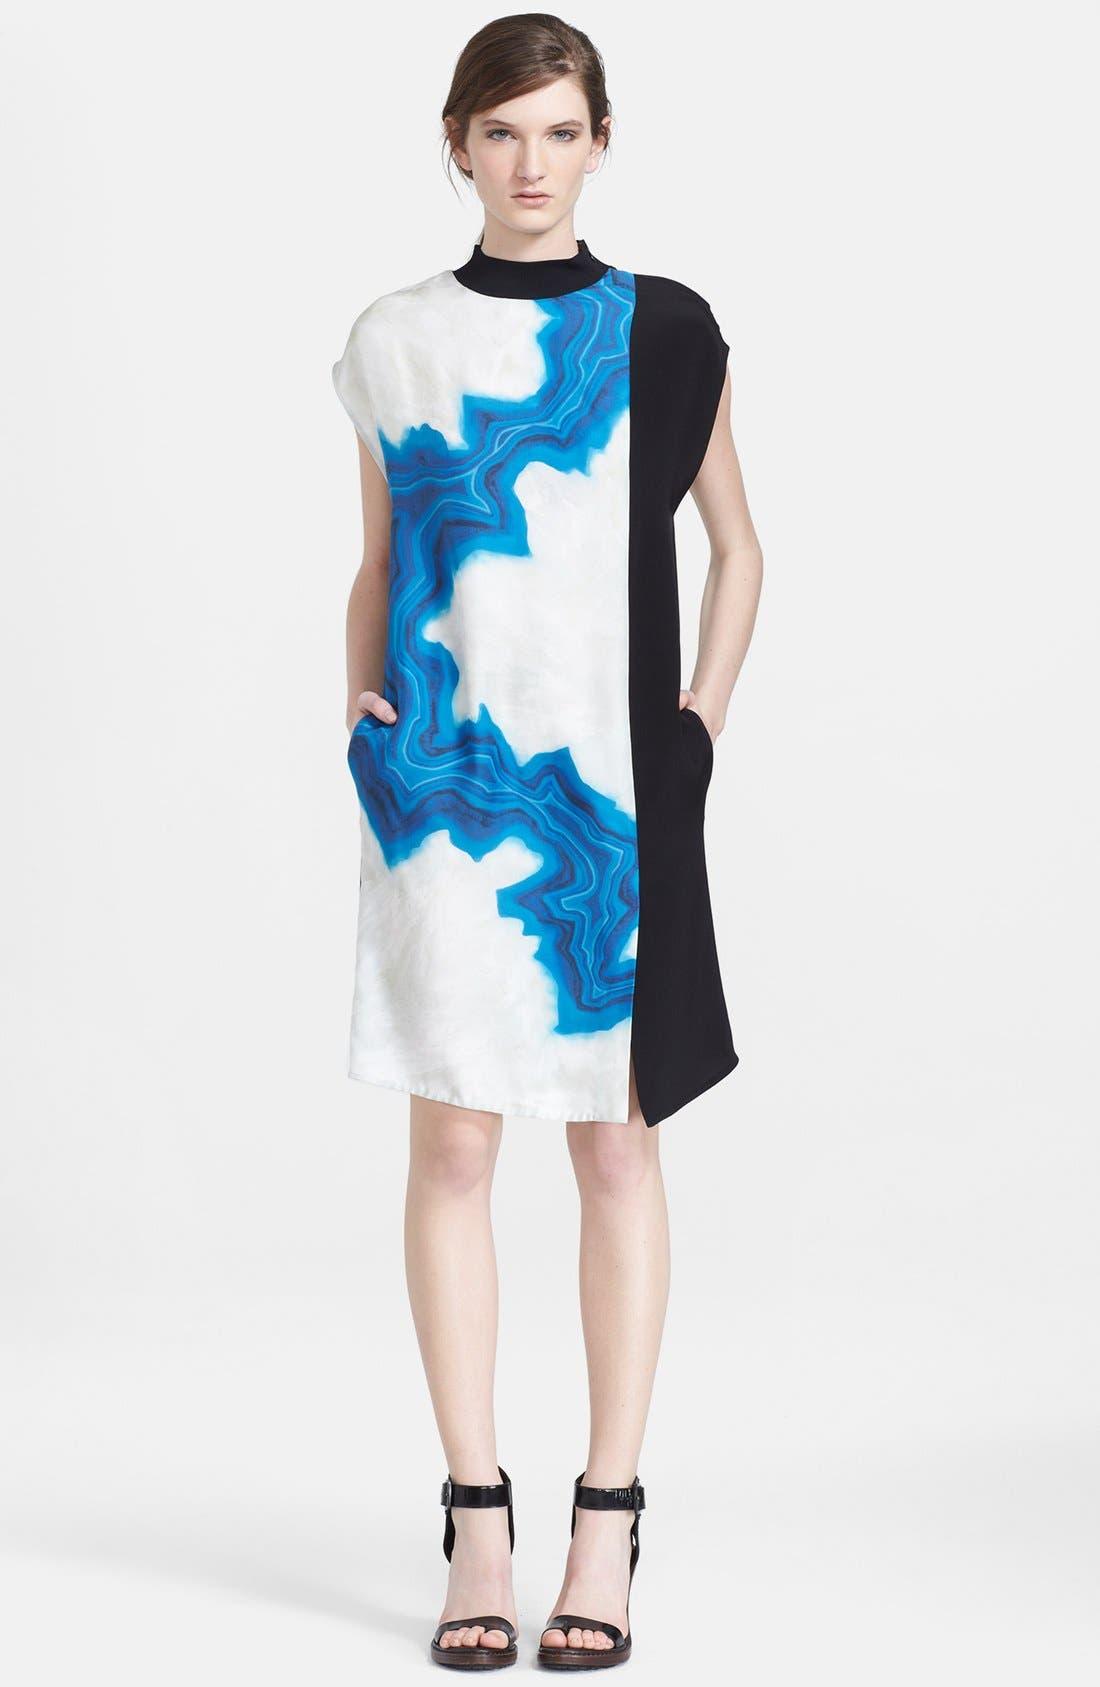 Main Image - 3.1 Phillip Lim Geode Print Colorblock Shift Dress